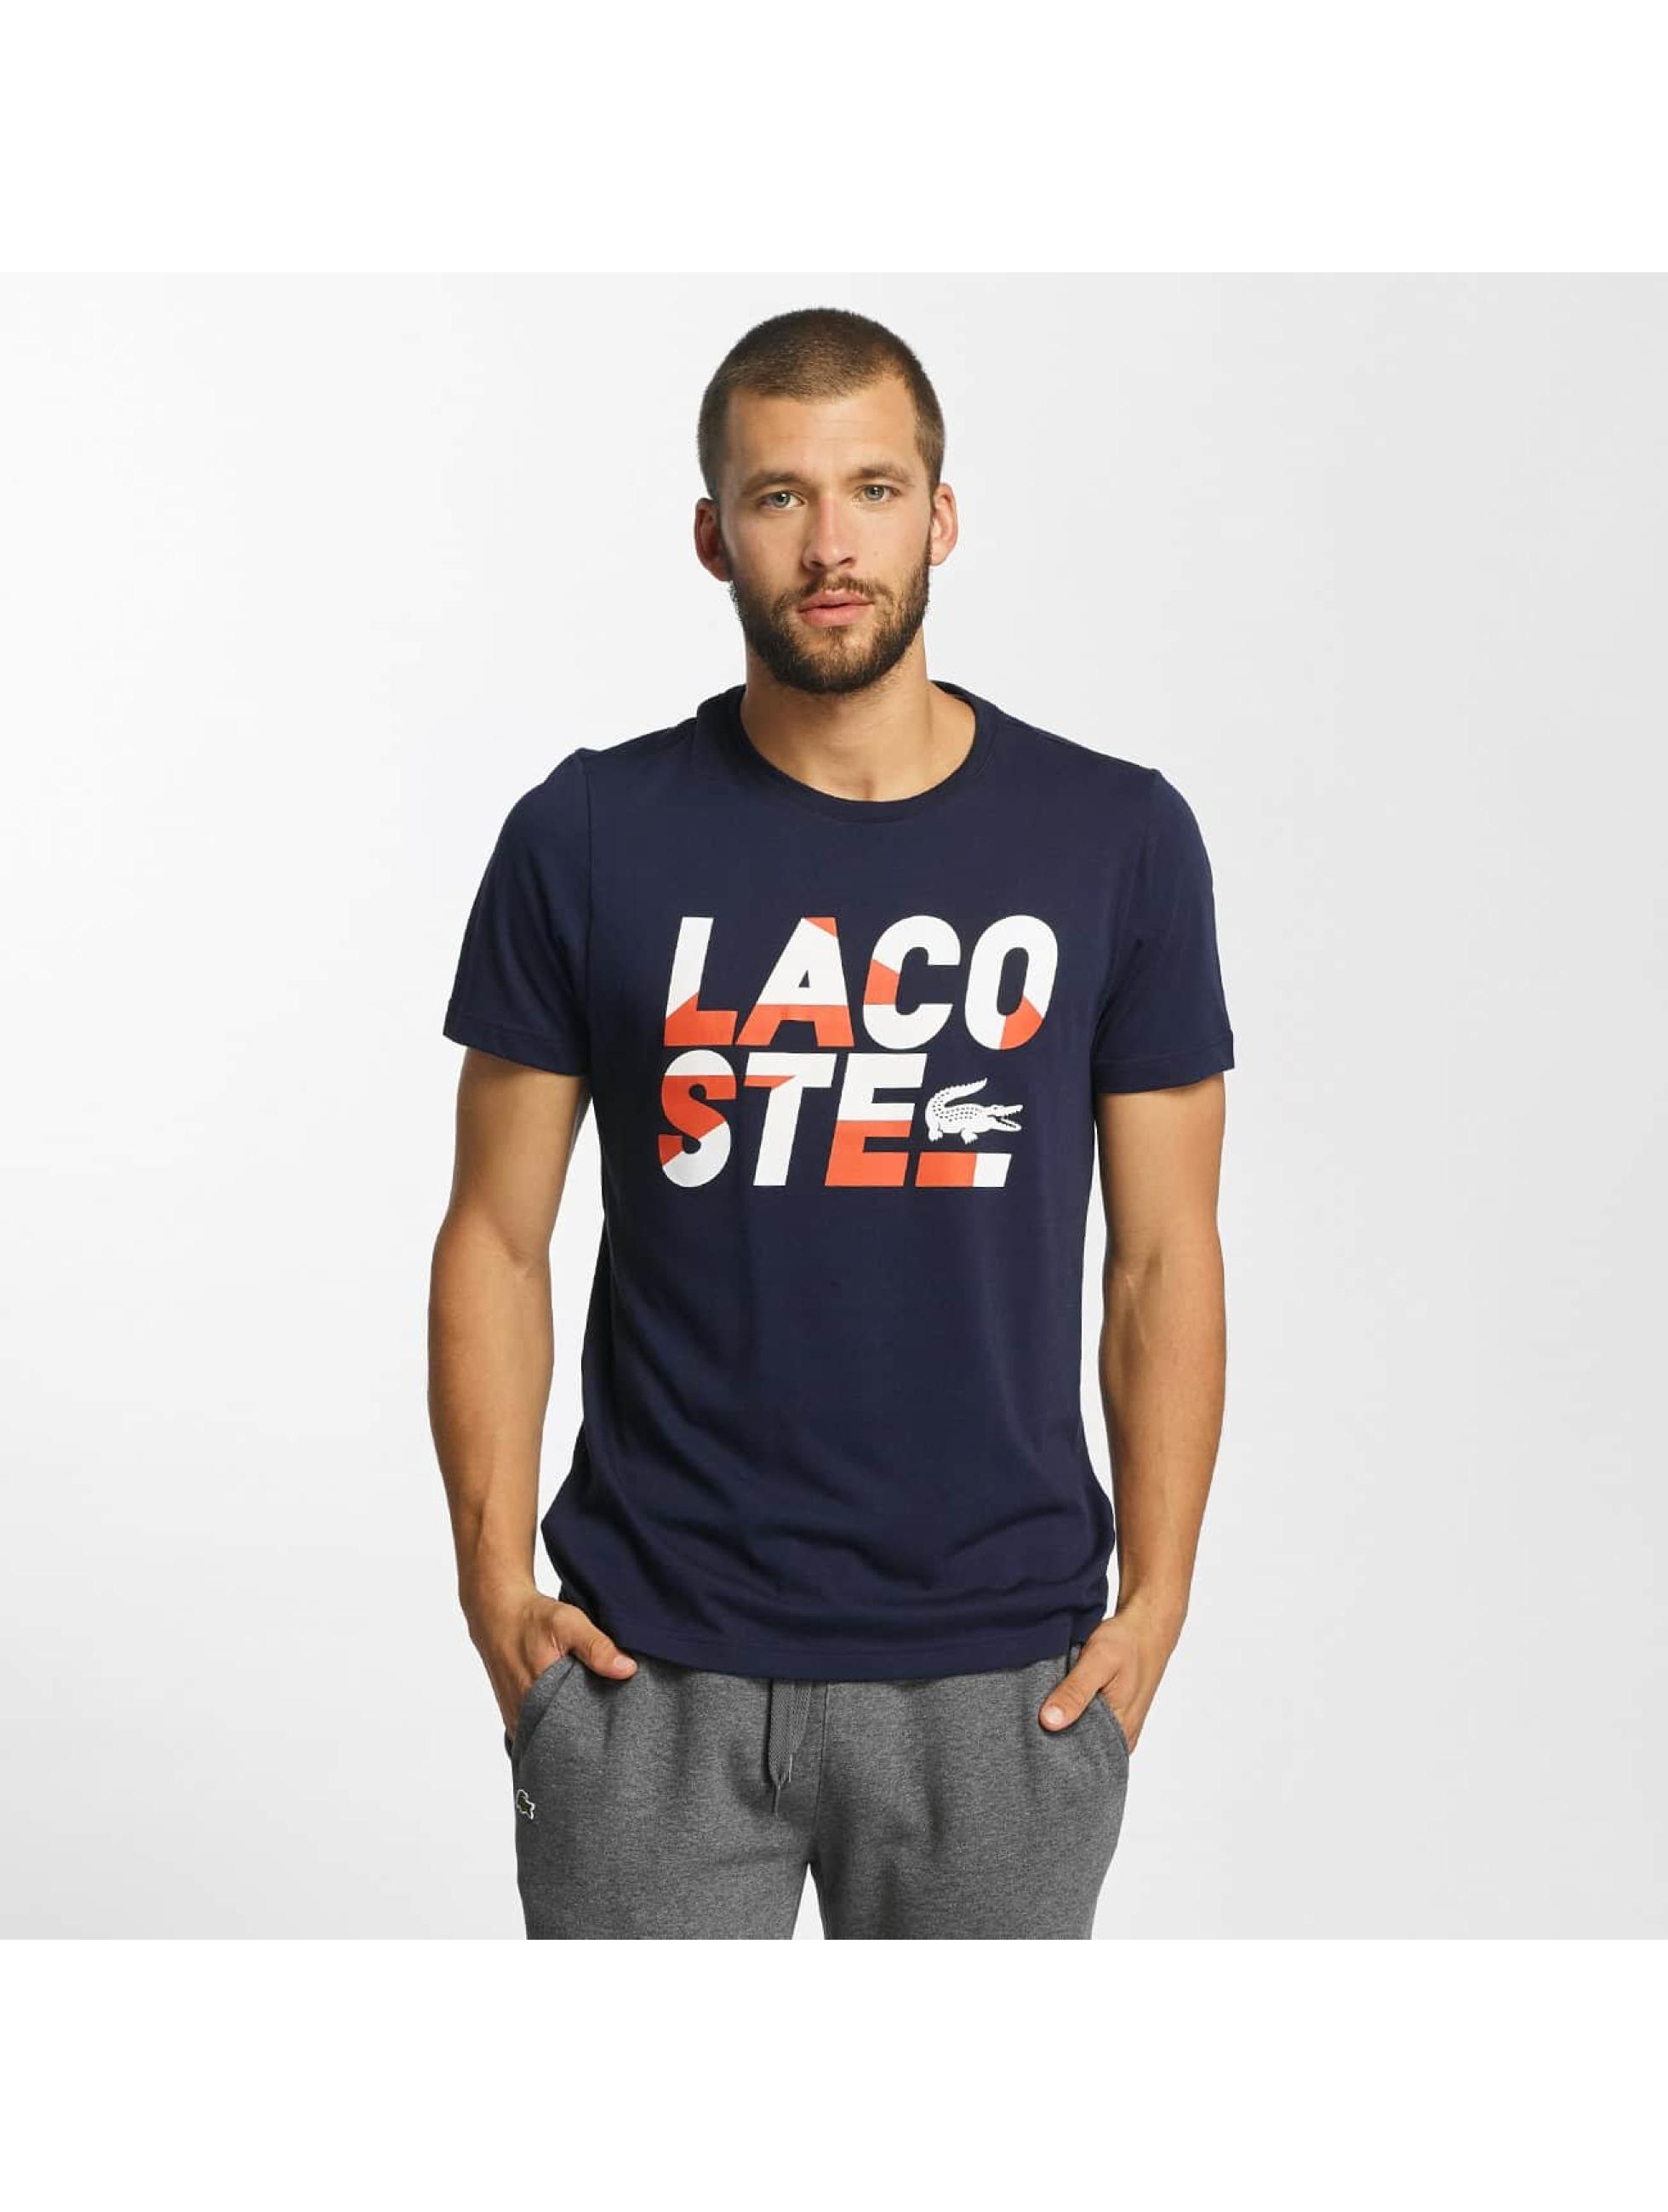 Lacoste T-Shirt Kroko blau